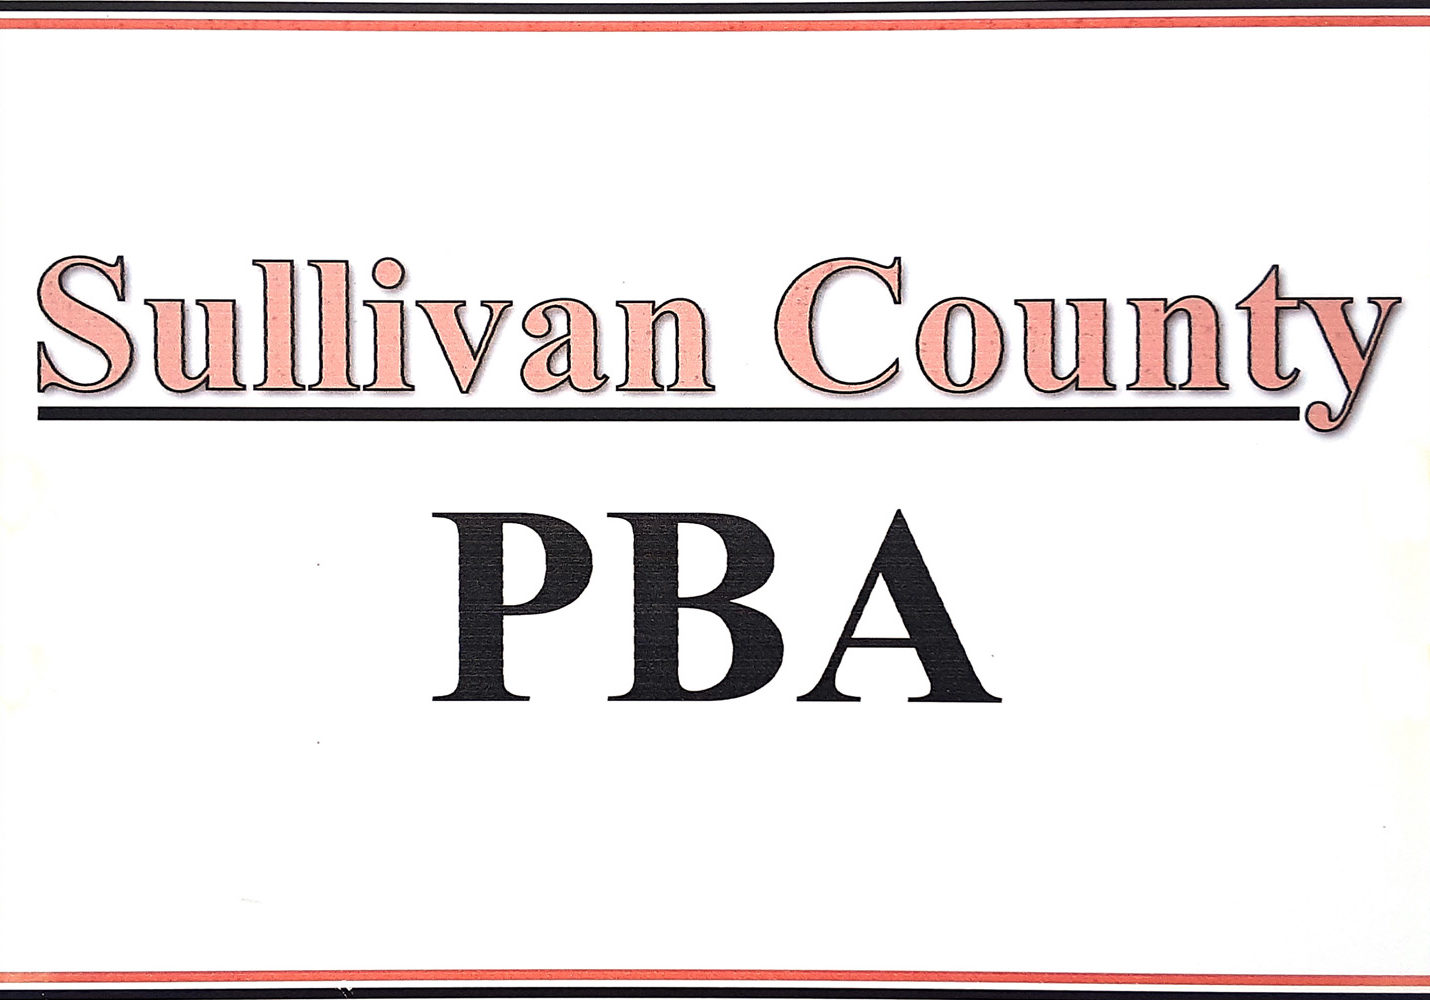 Sullivan County PBA